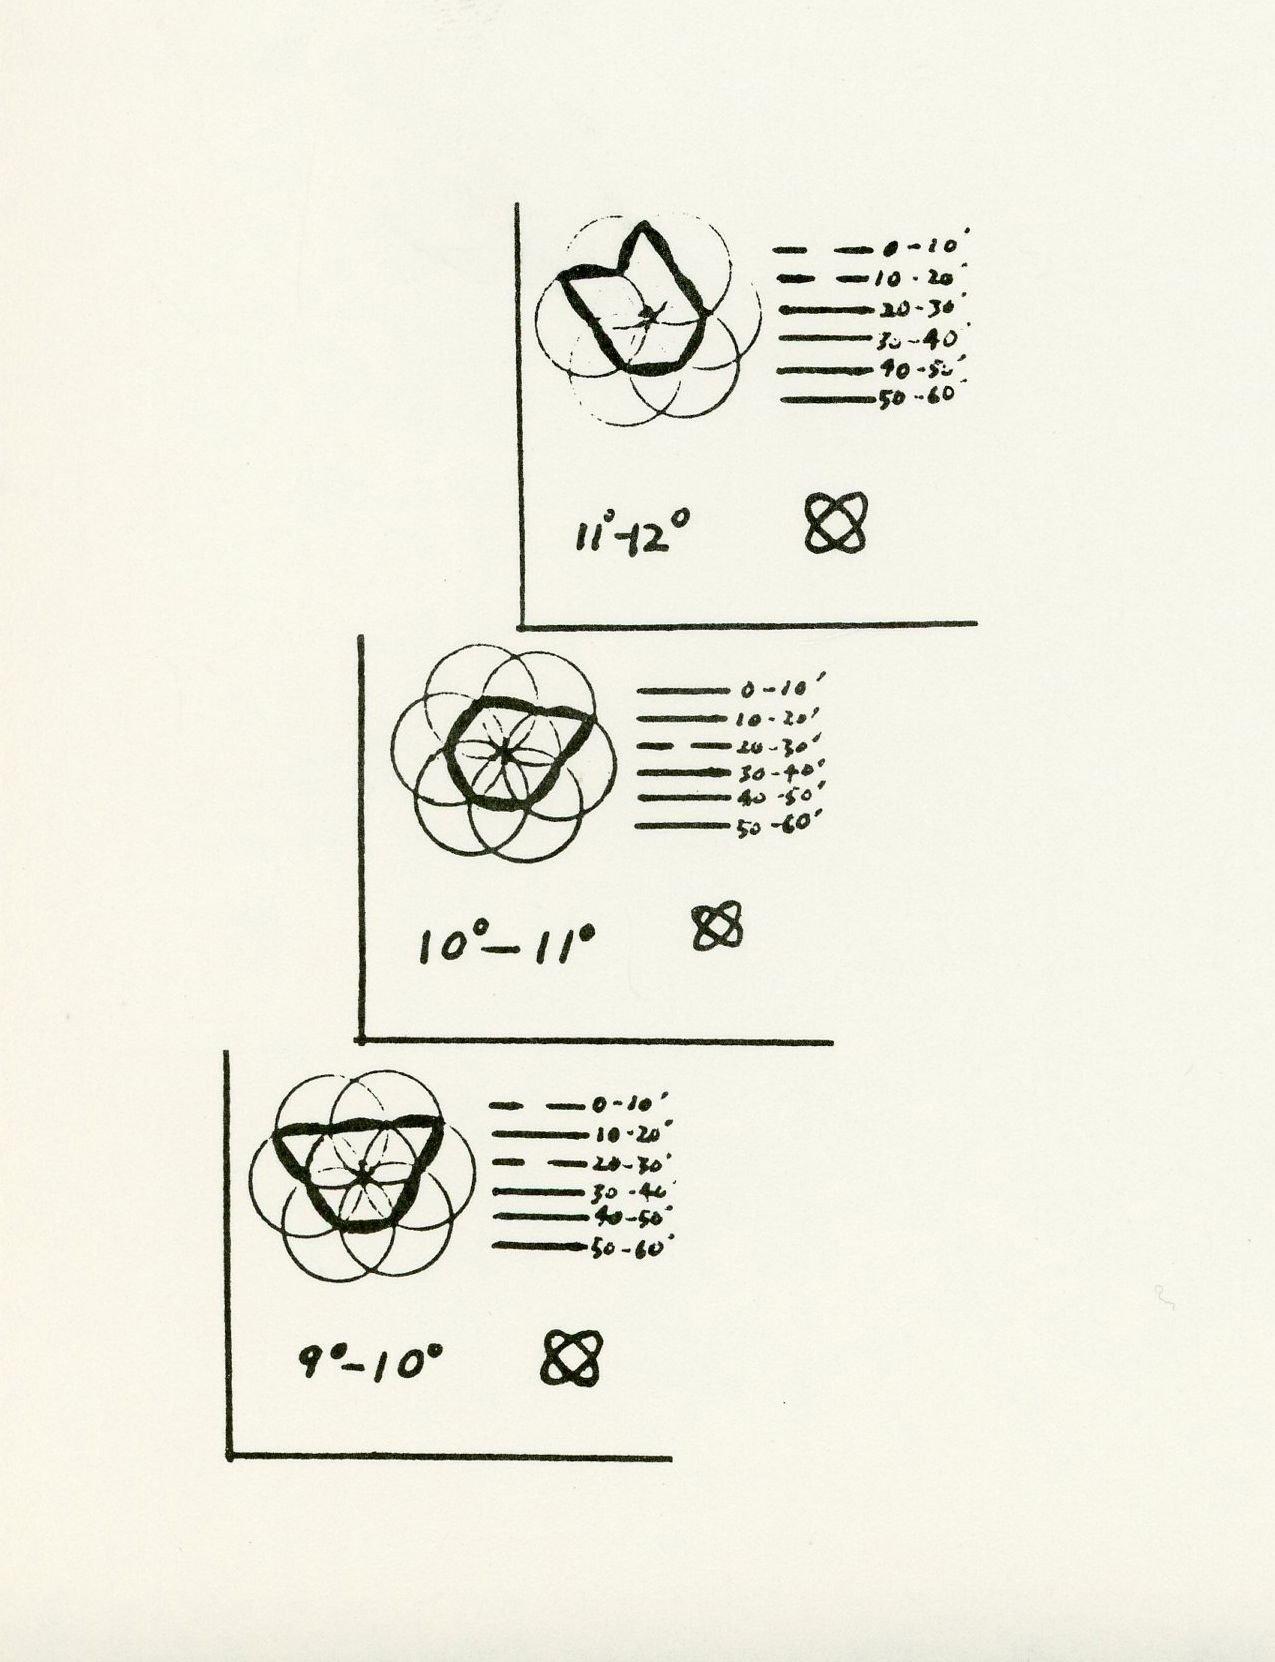 AL1-116